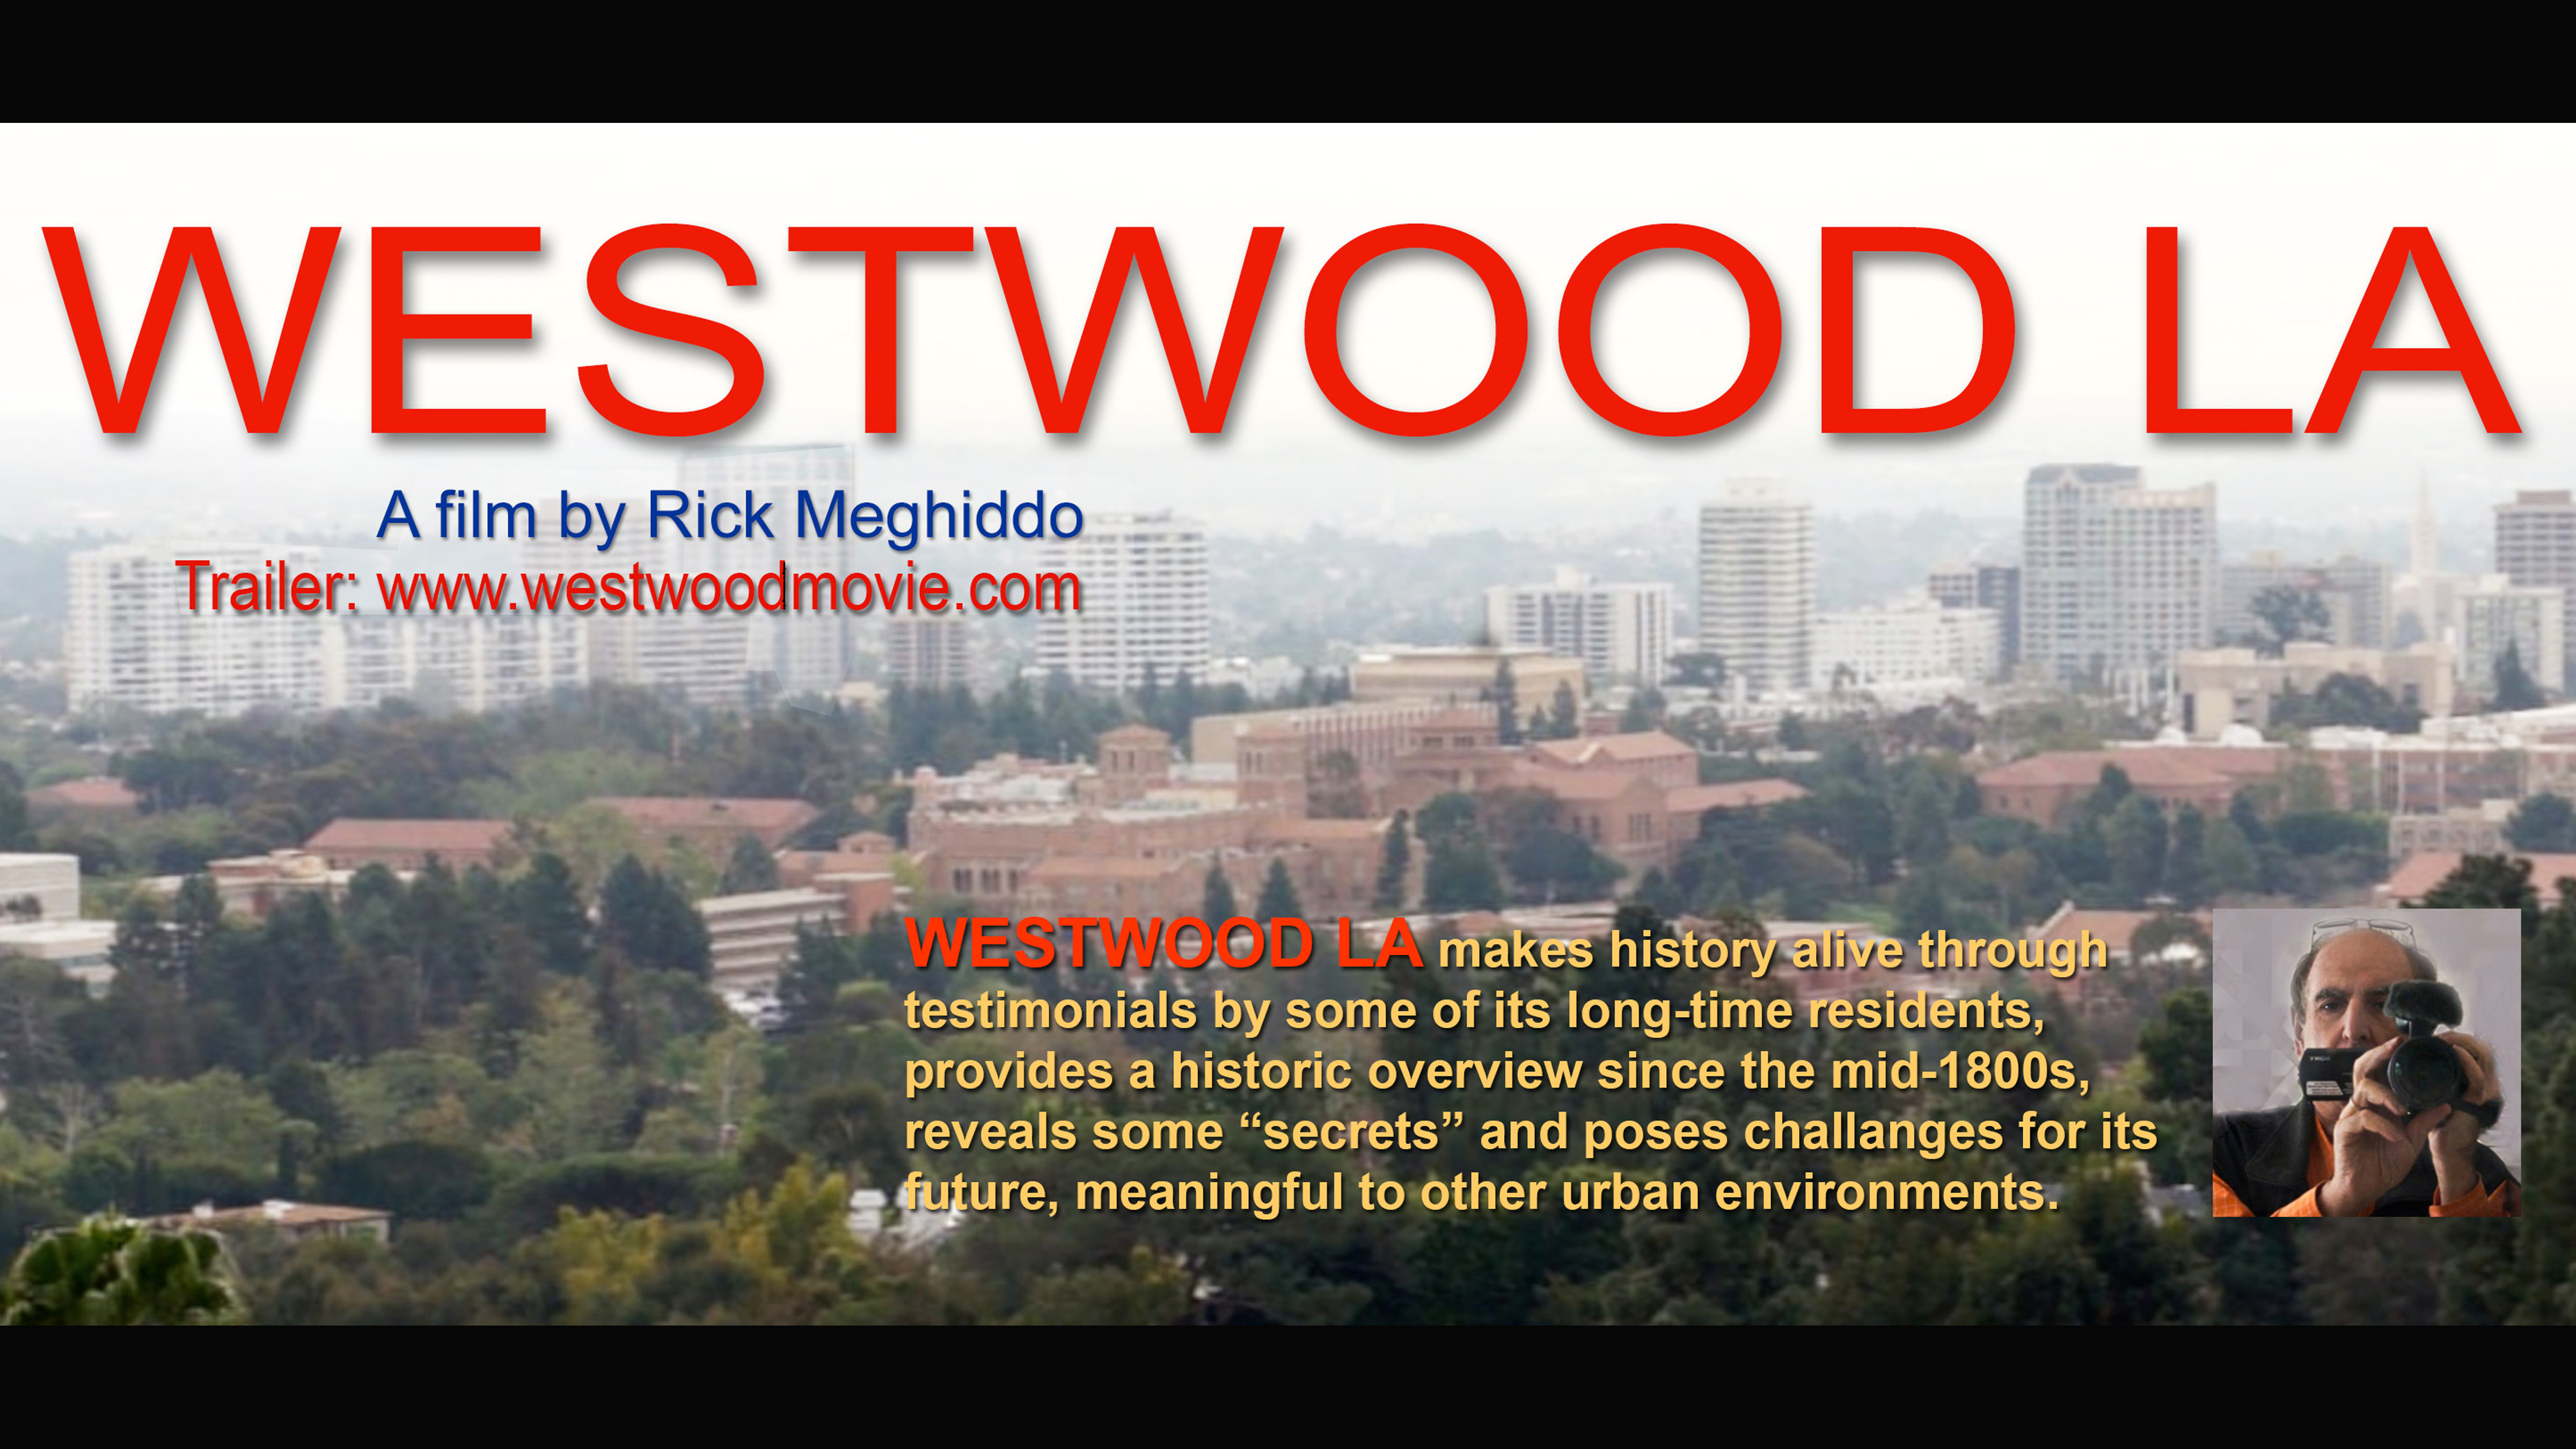 Westwood LA, Rick meghiddo